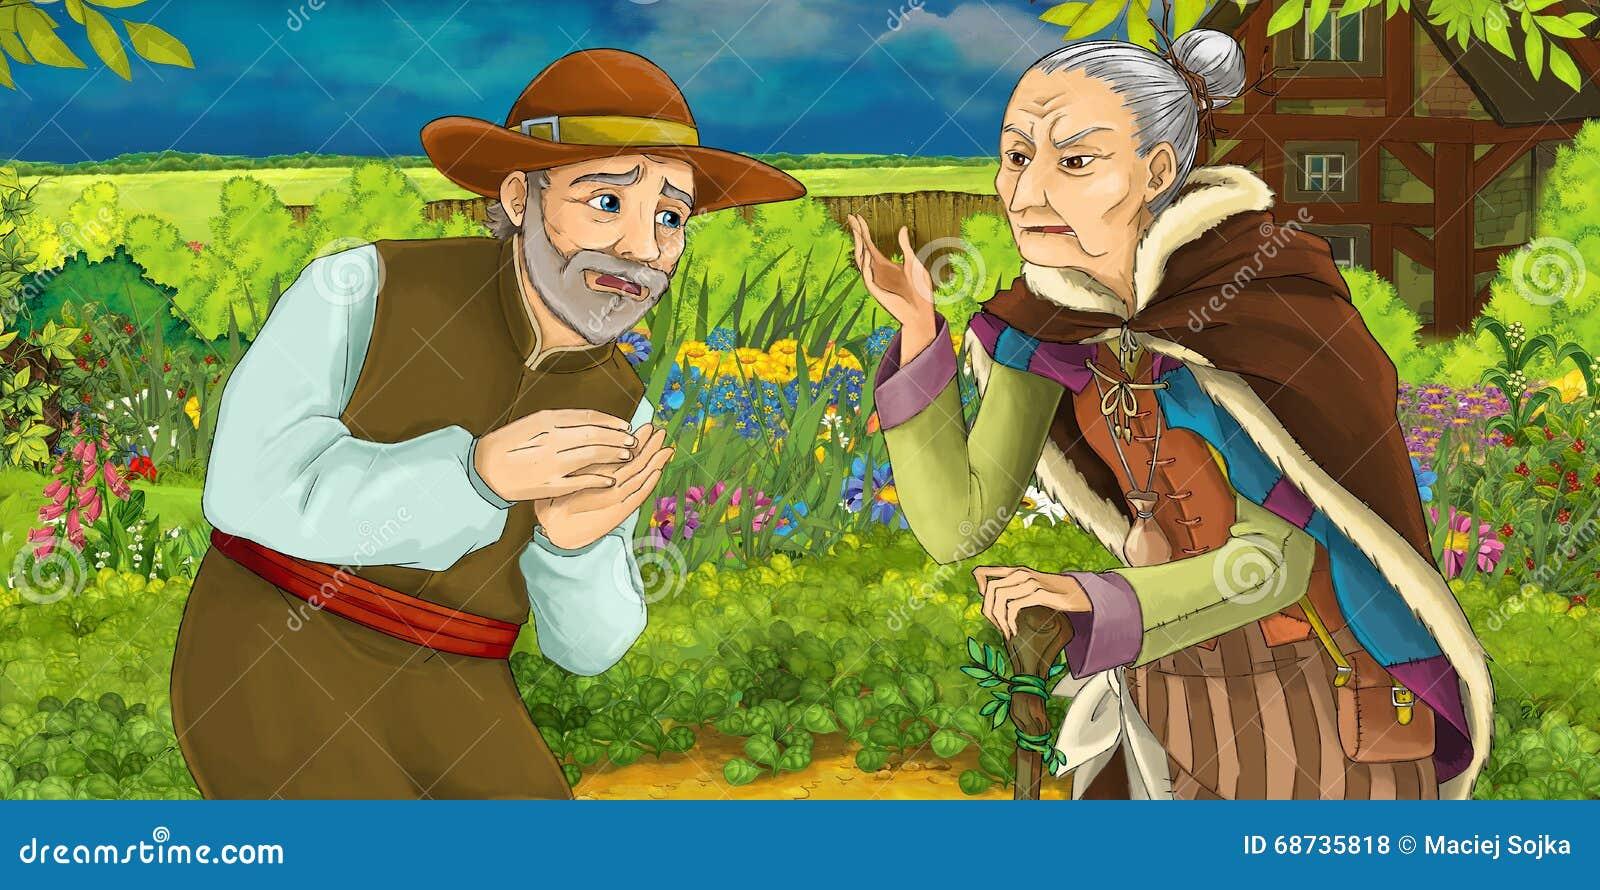 Beautiful garden cartoon - Cartoon Illustration Of A Man Talking With An Old Woman In A Herb Garden Royalty Free